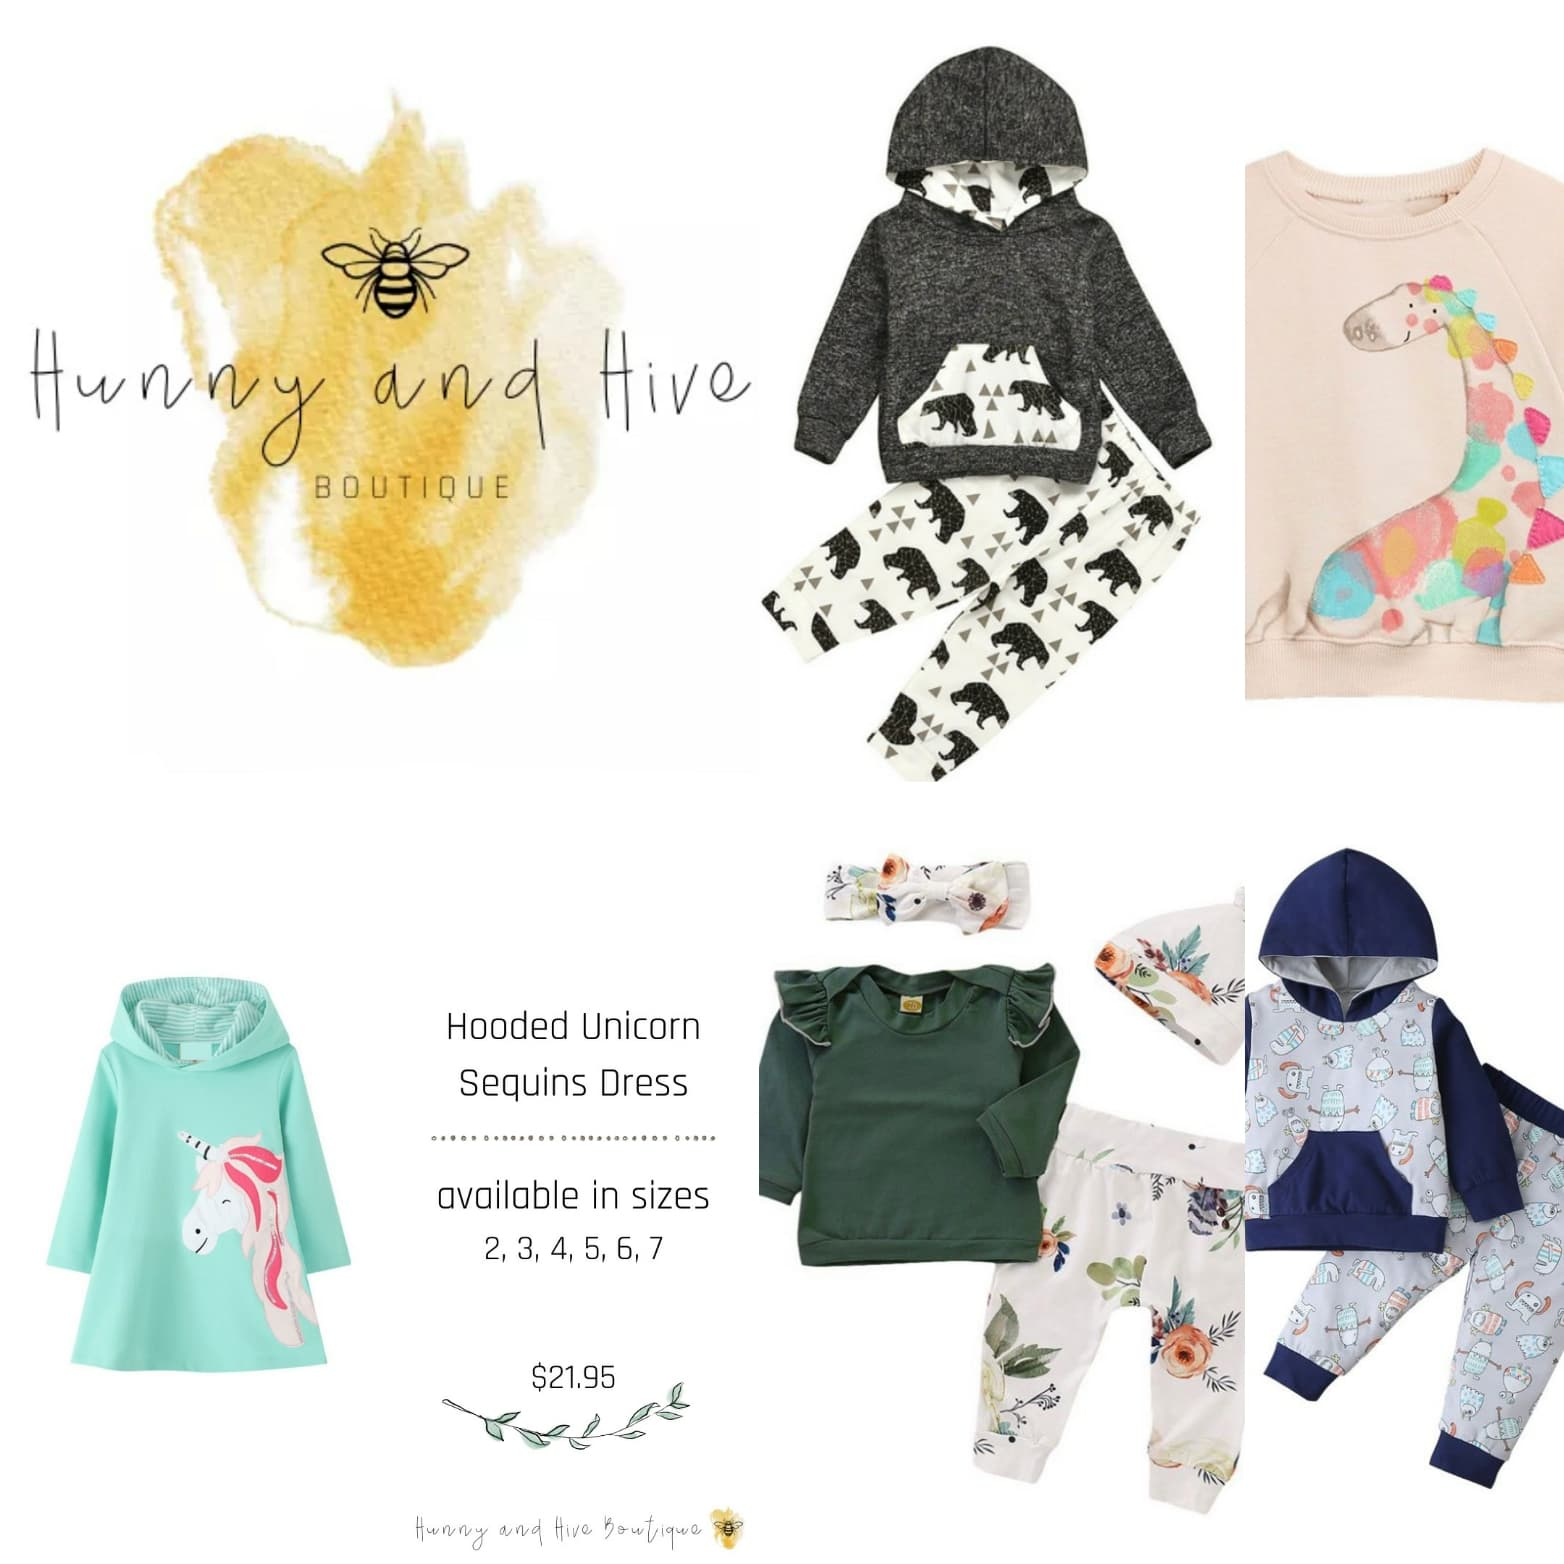 Hunny & Hive